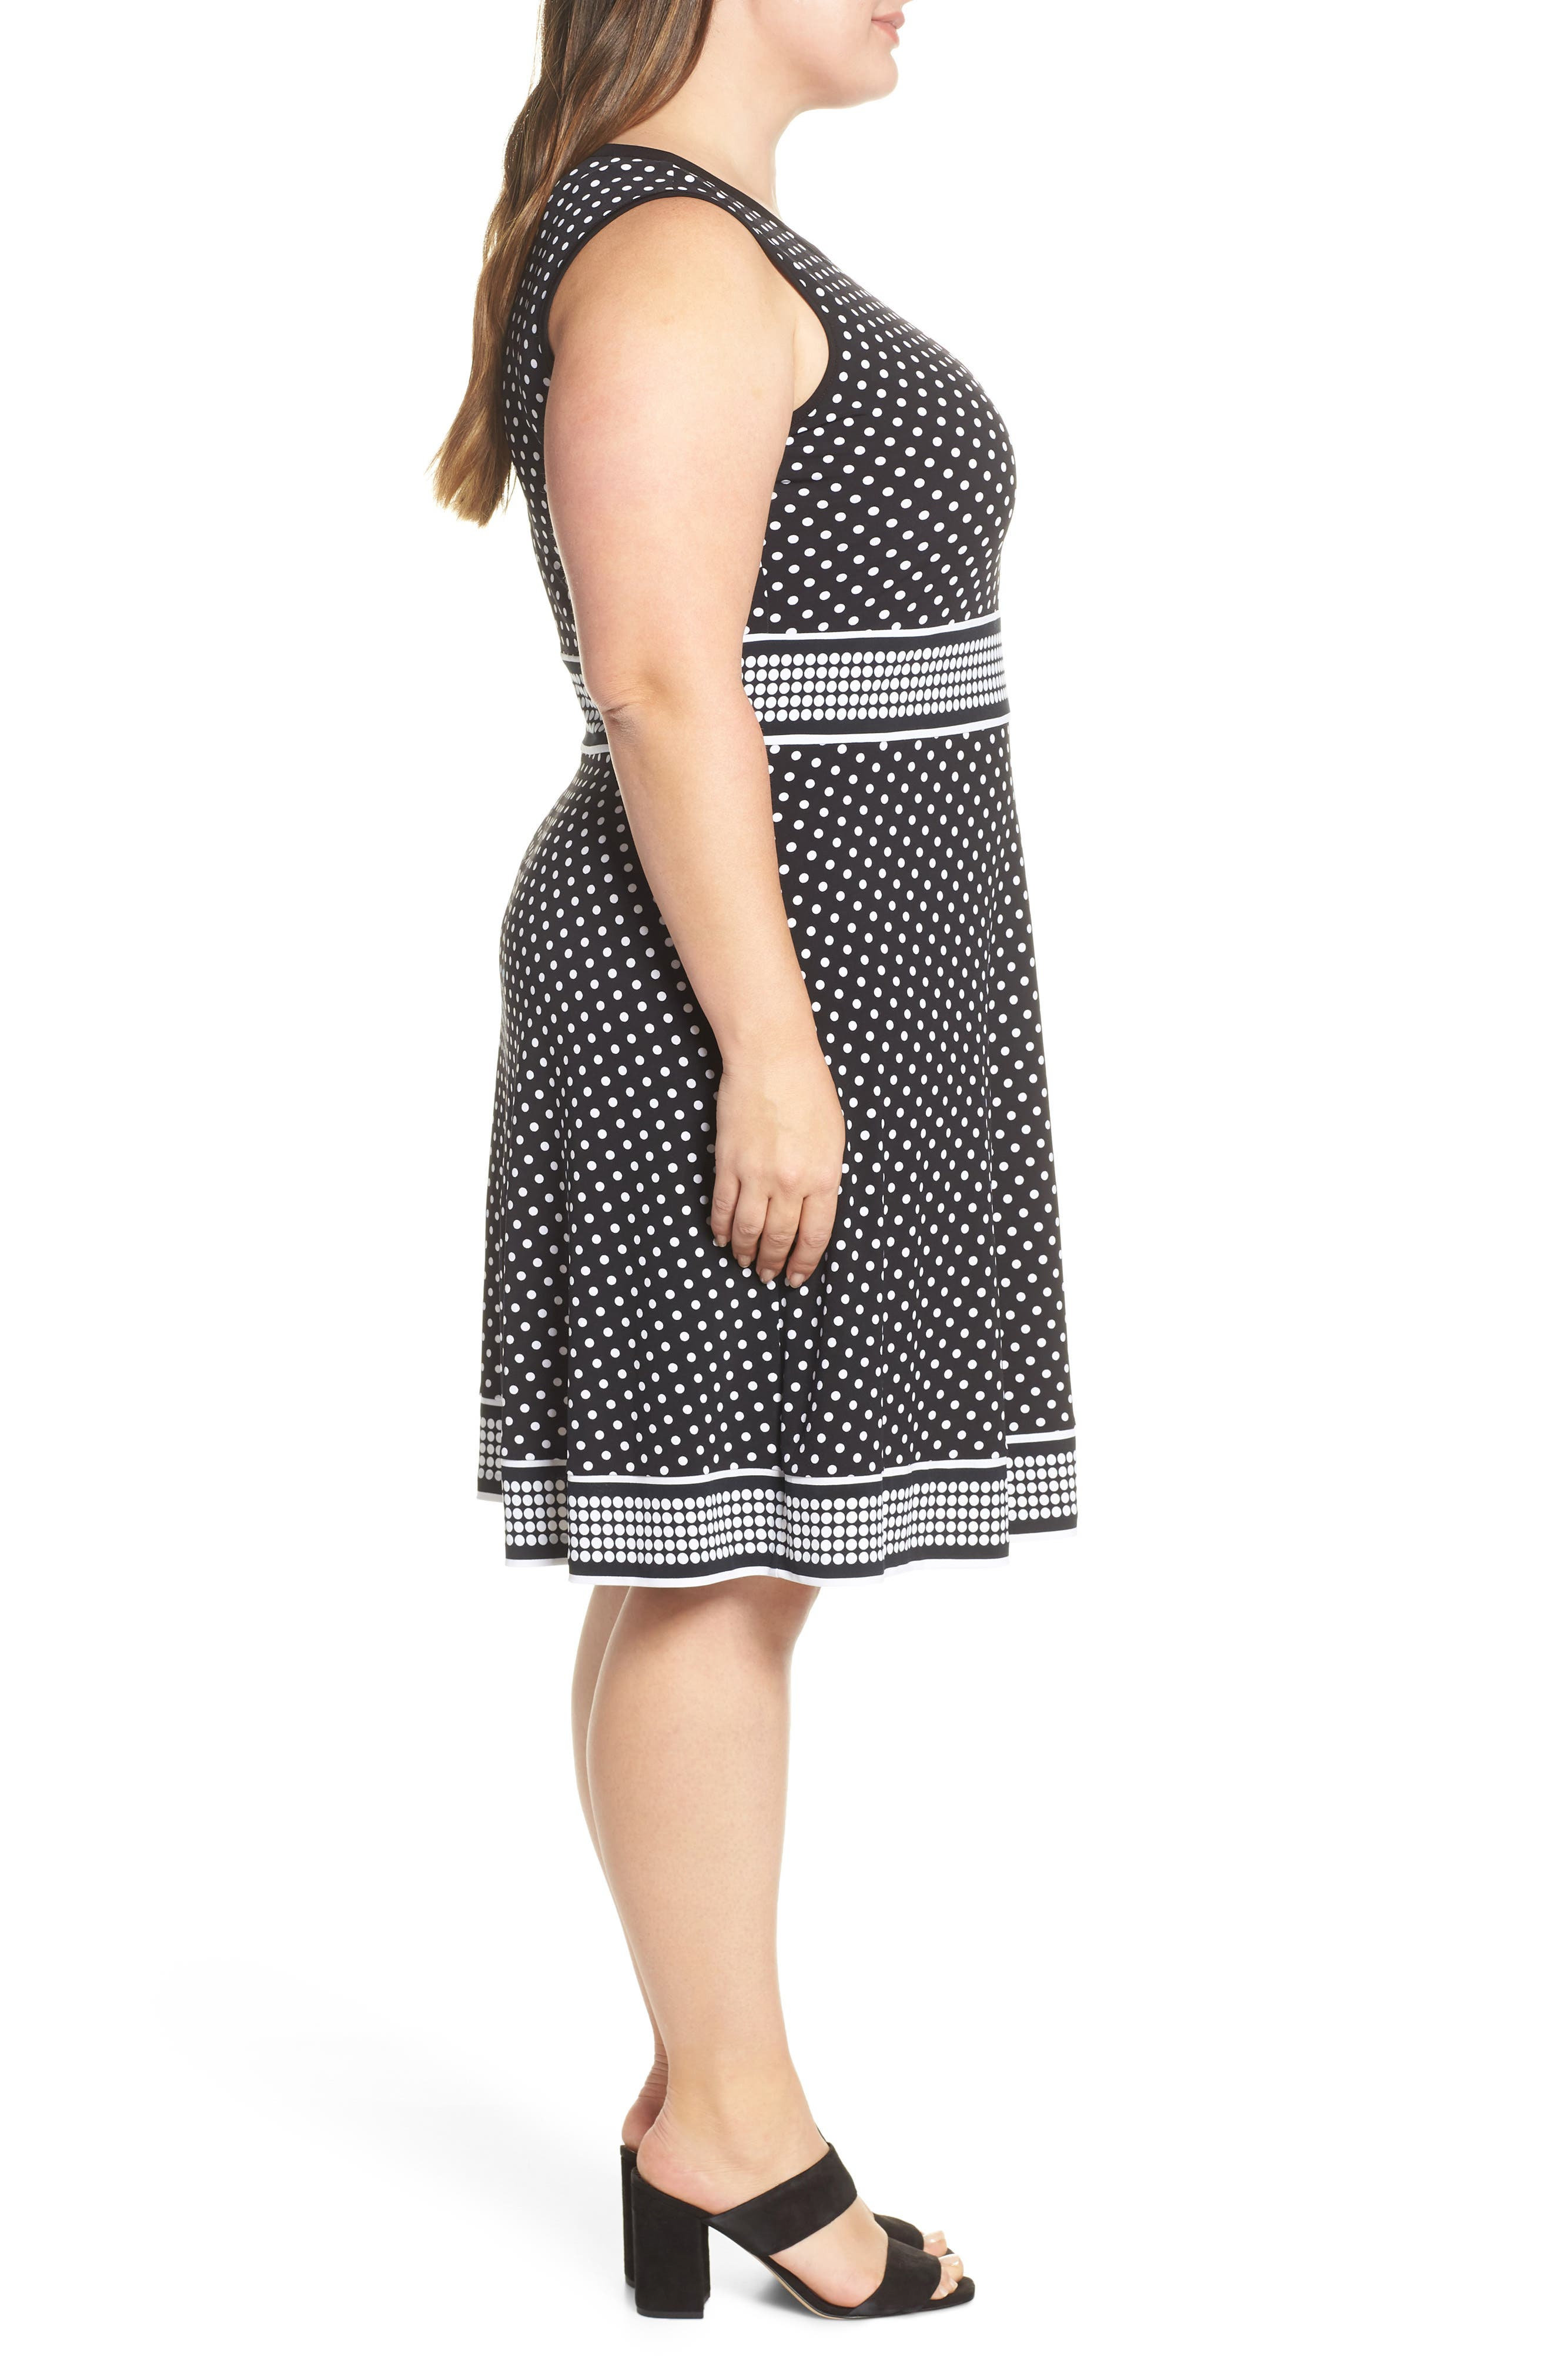 MICHAEL MICHAEL KORS, Mixed Polka Dot Dress, Alternate thumbnail 4, color, BLACK/ WHITE